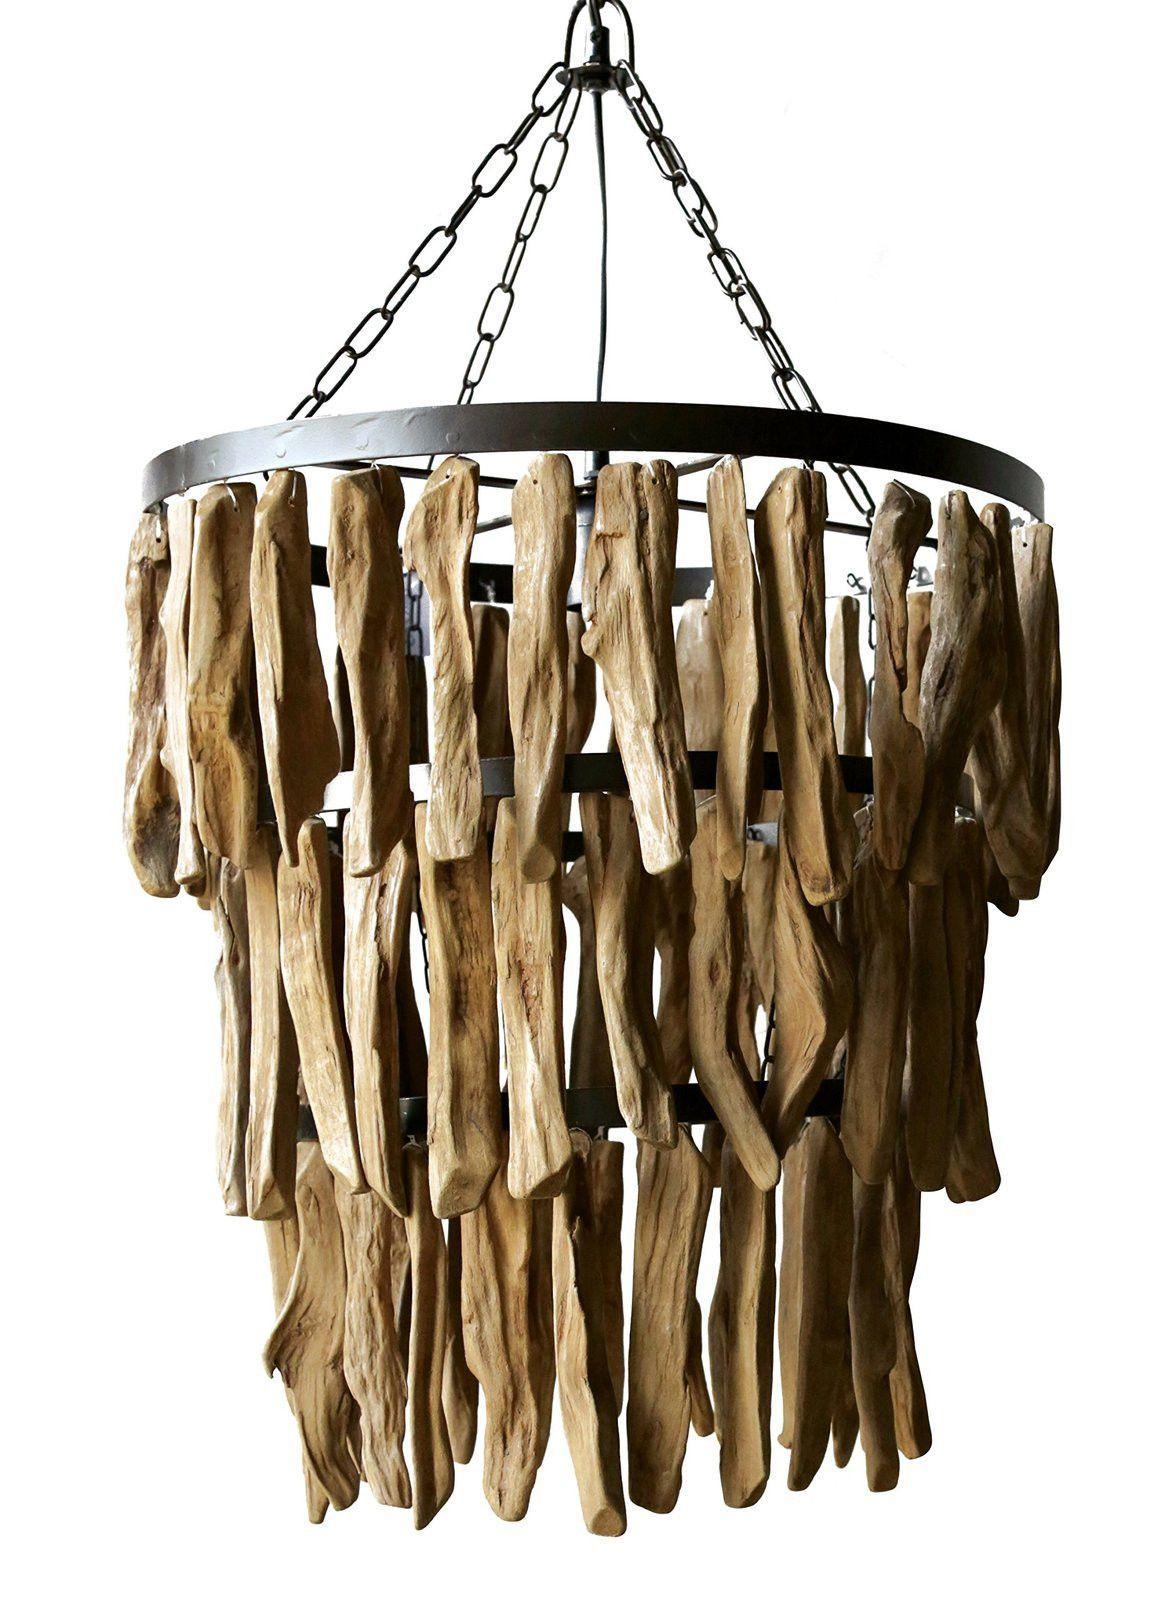 Selous Rustic Lodge Abstract Driftwood 3 Light Chandelier Met